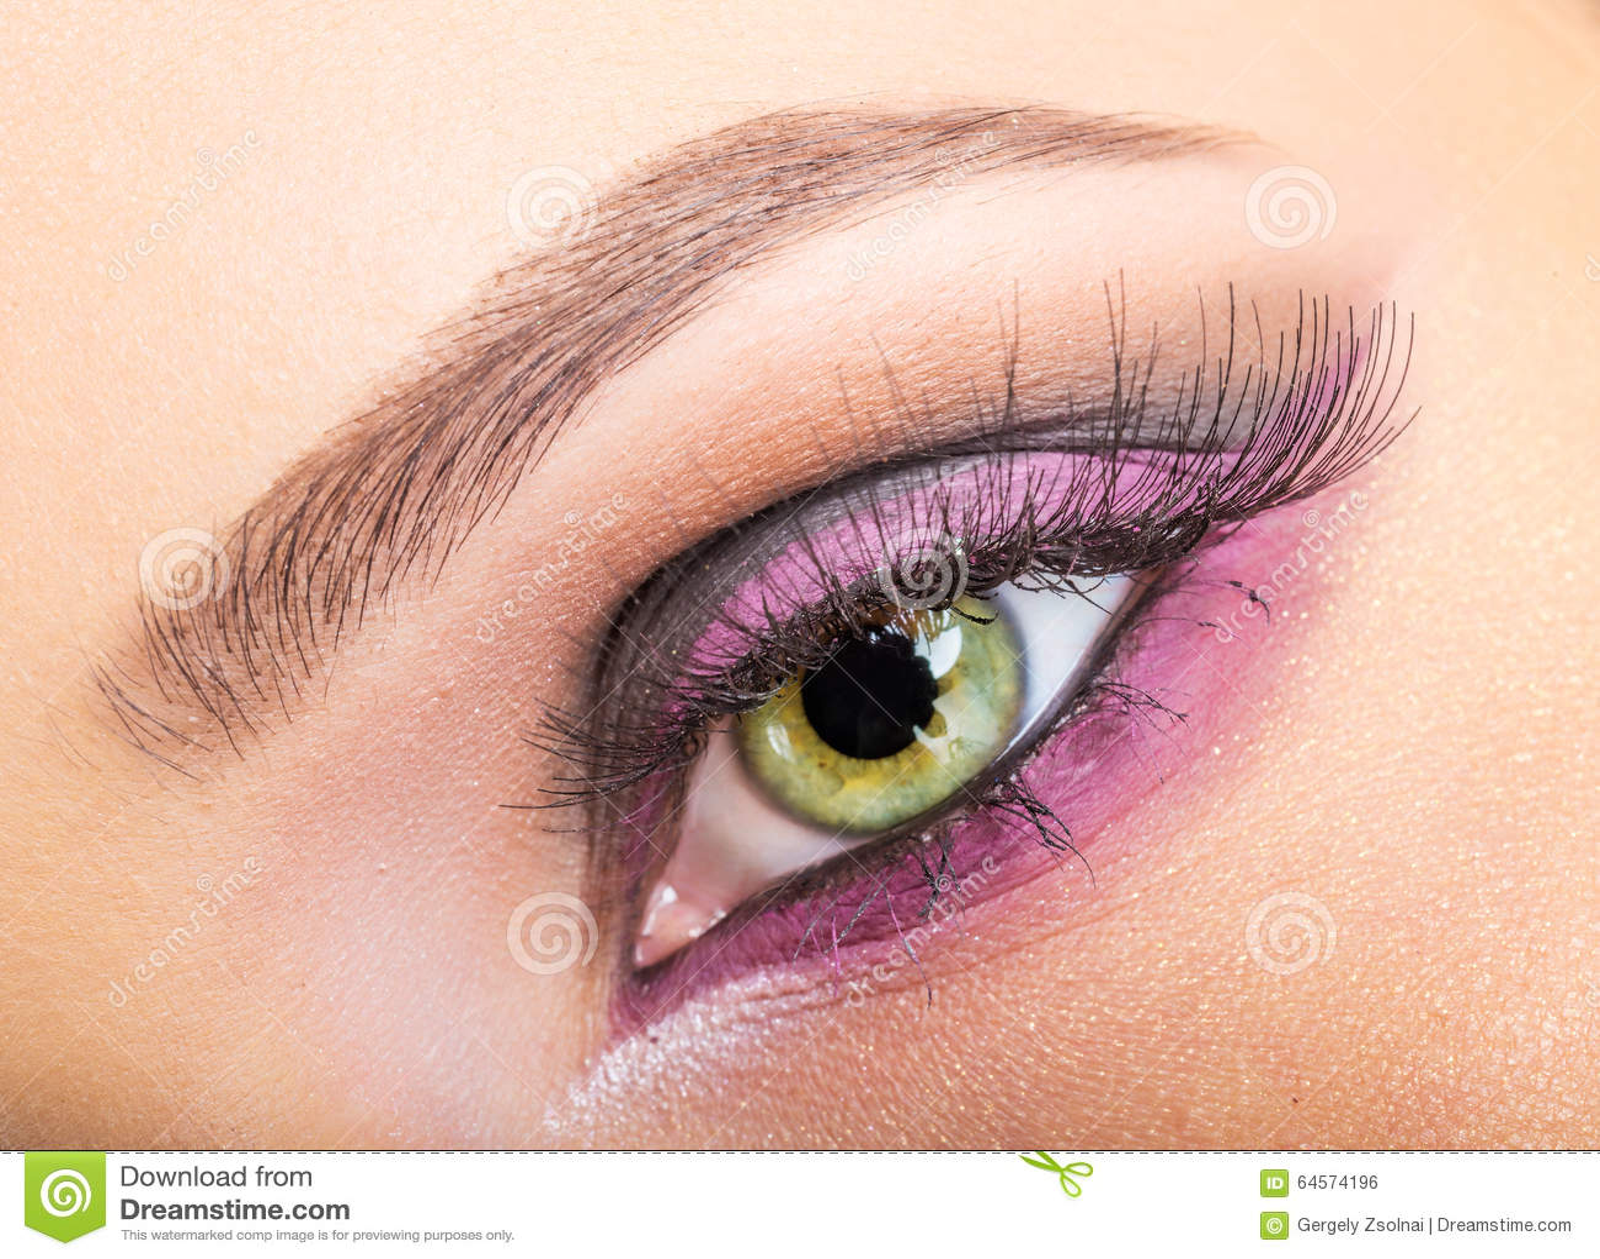 Fashion week Makeup eye purple close up photo for woman